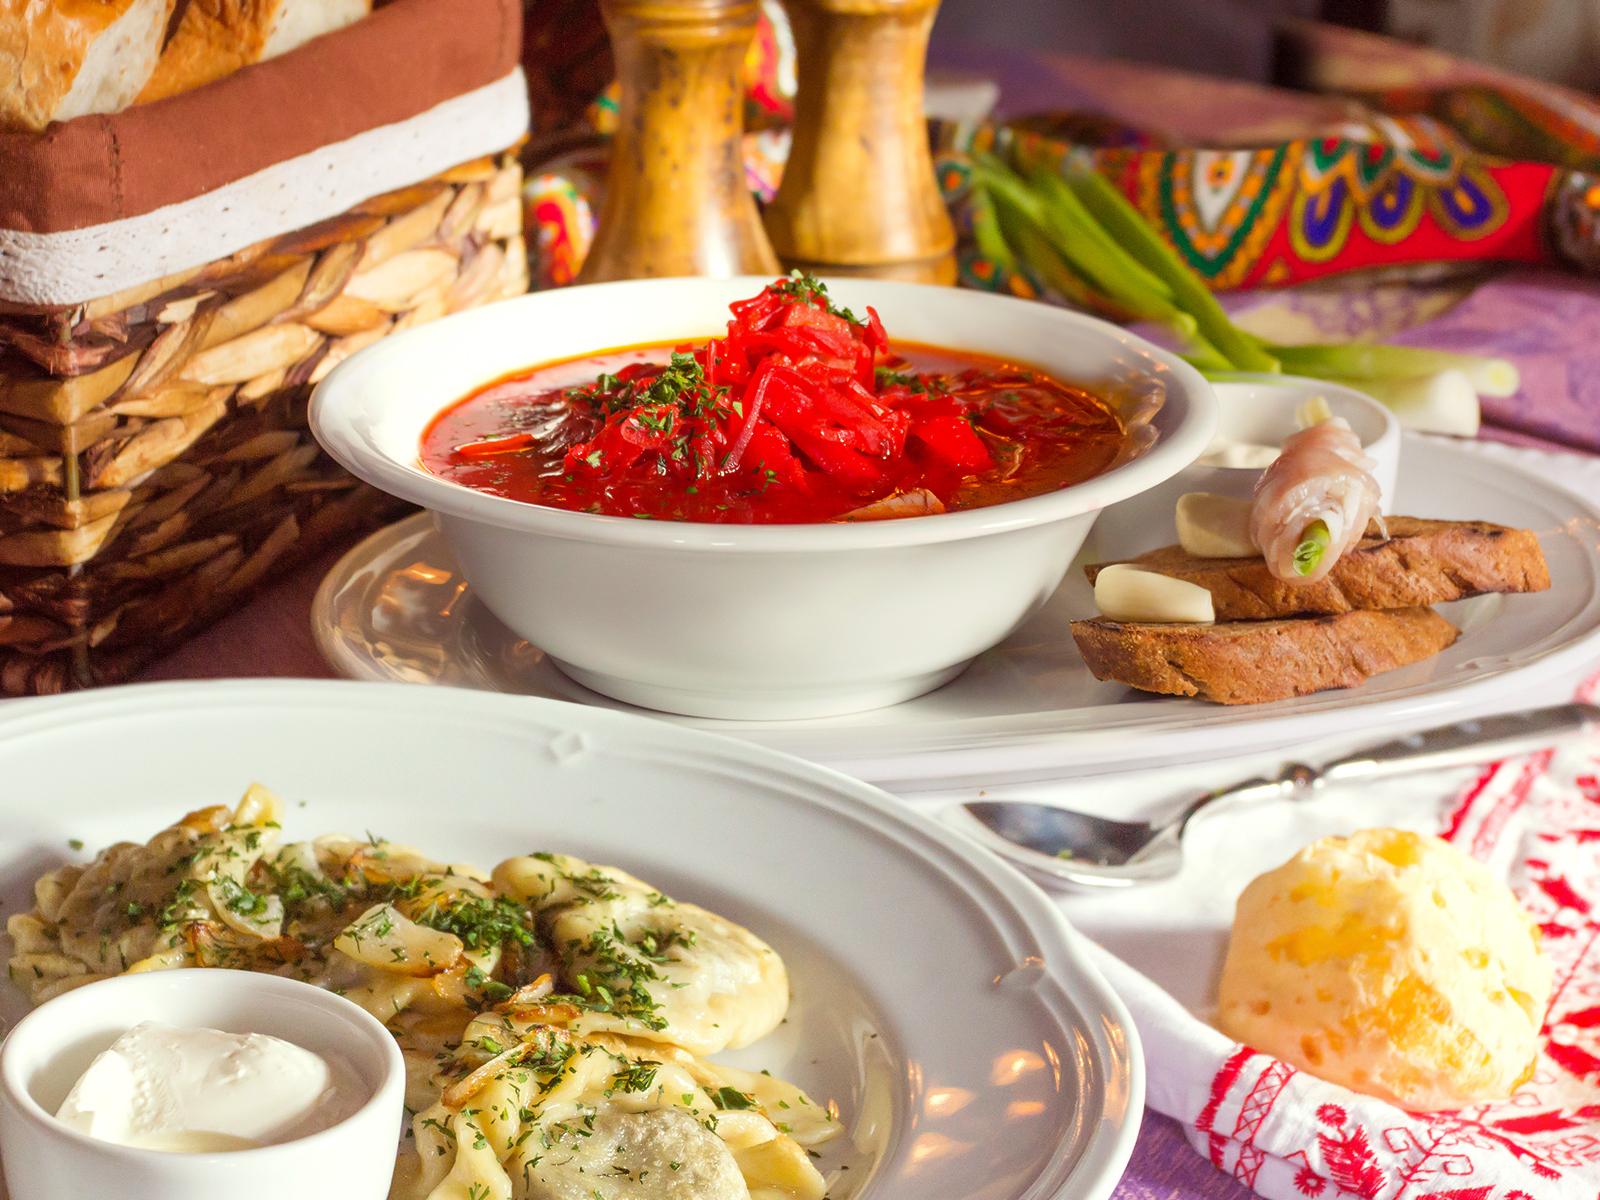 Ресторан домашней кухни Boho